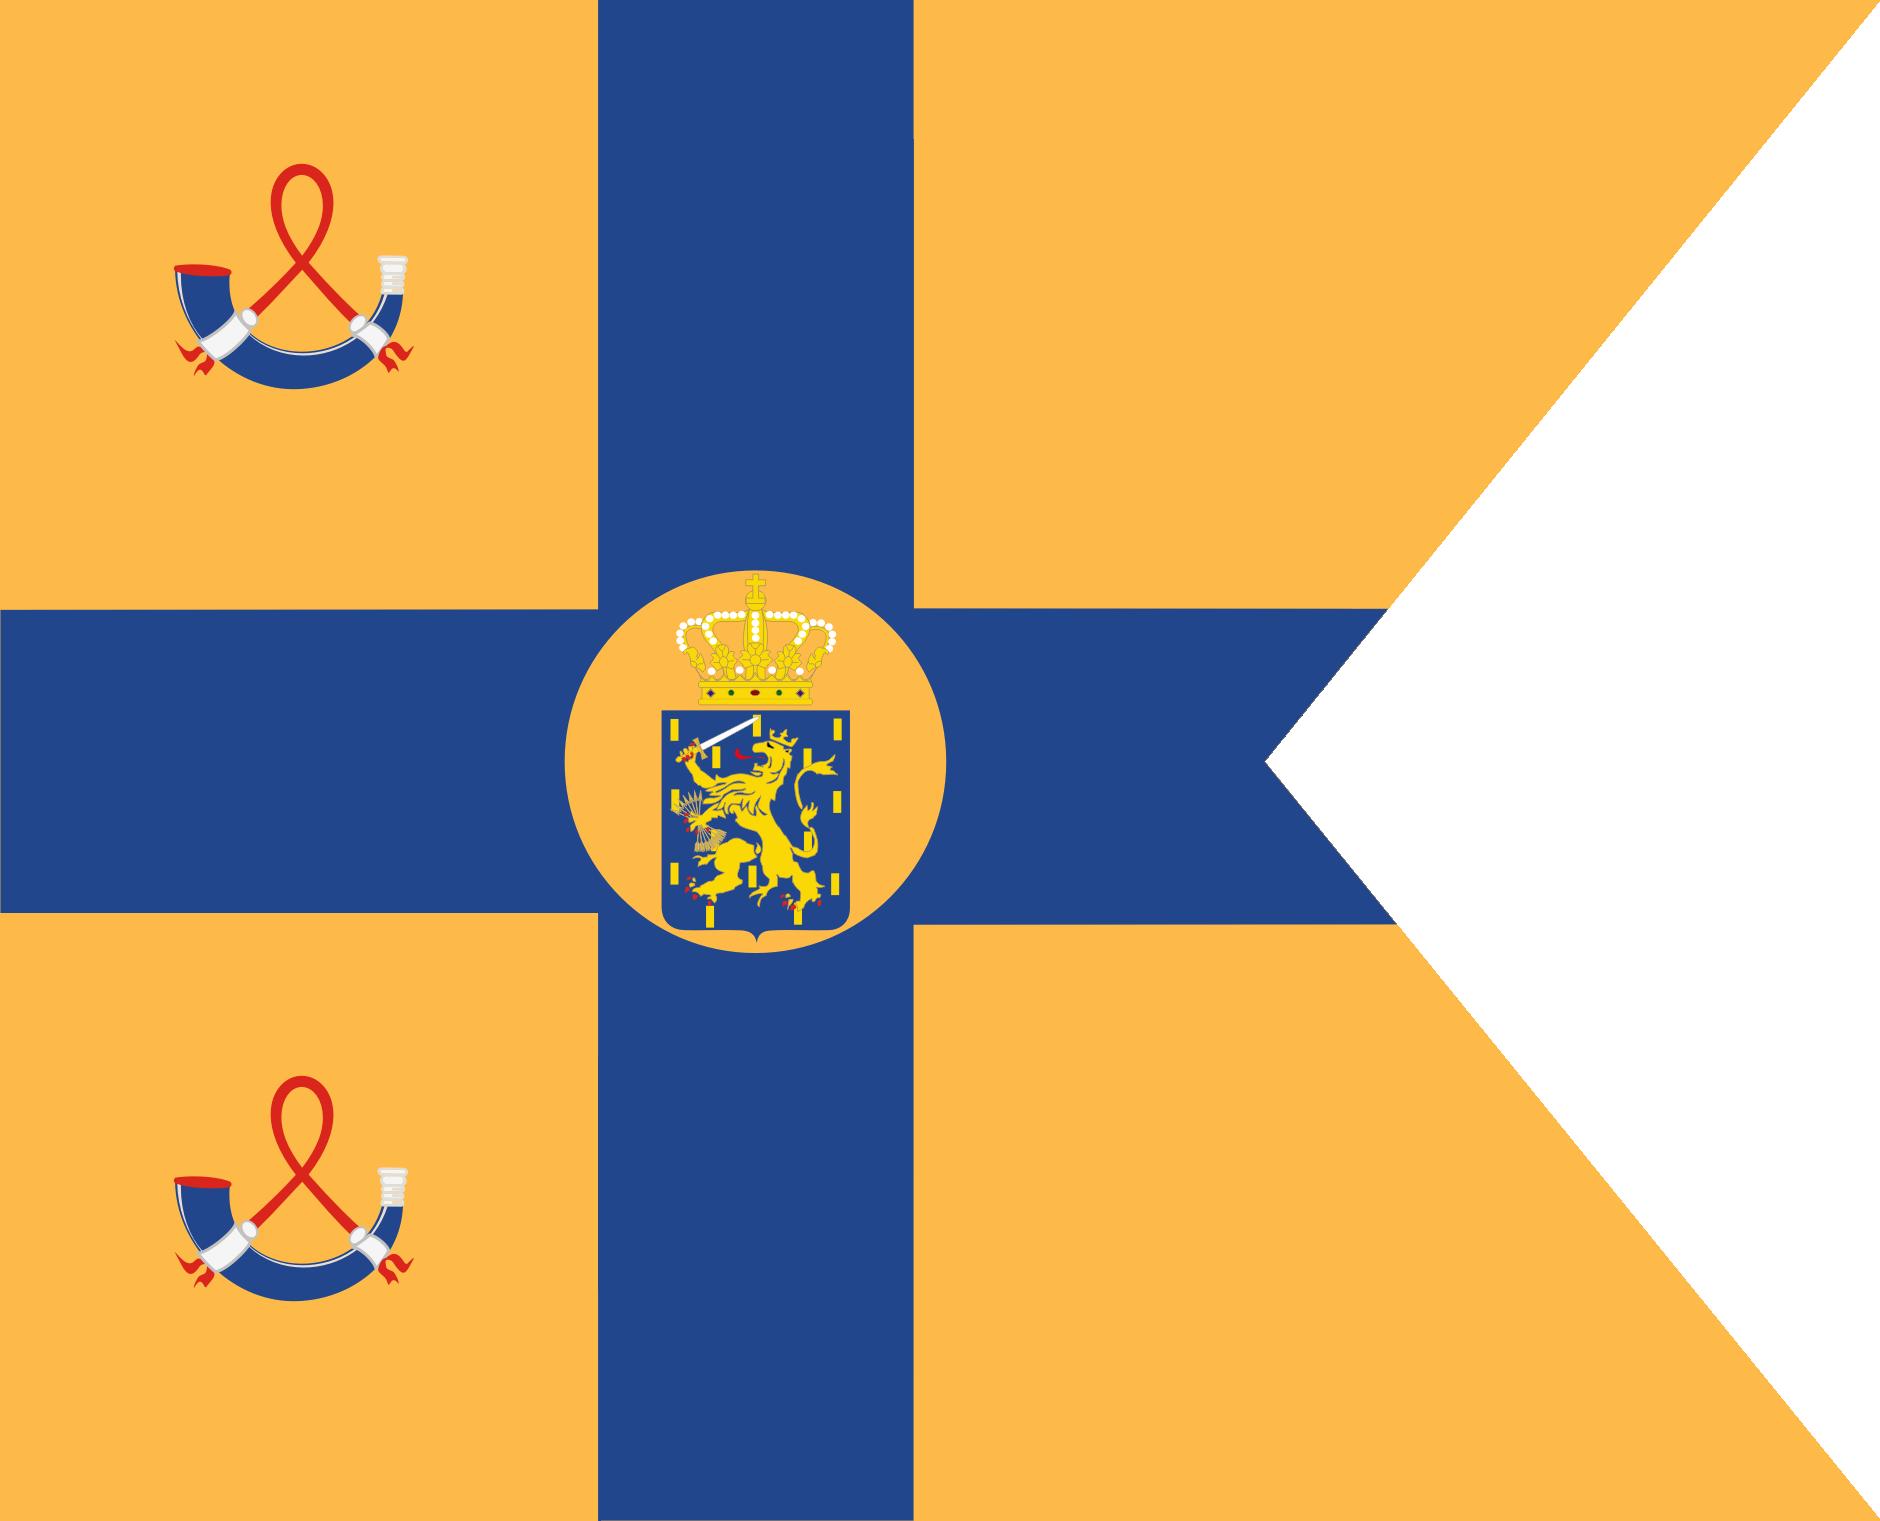 Standard of Marie von Wied, Princess of the Netherlands